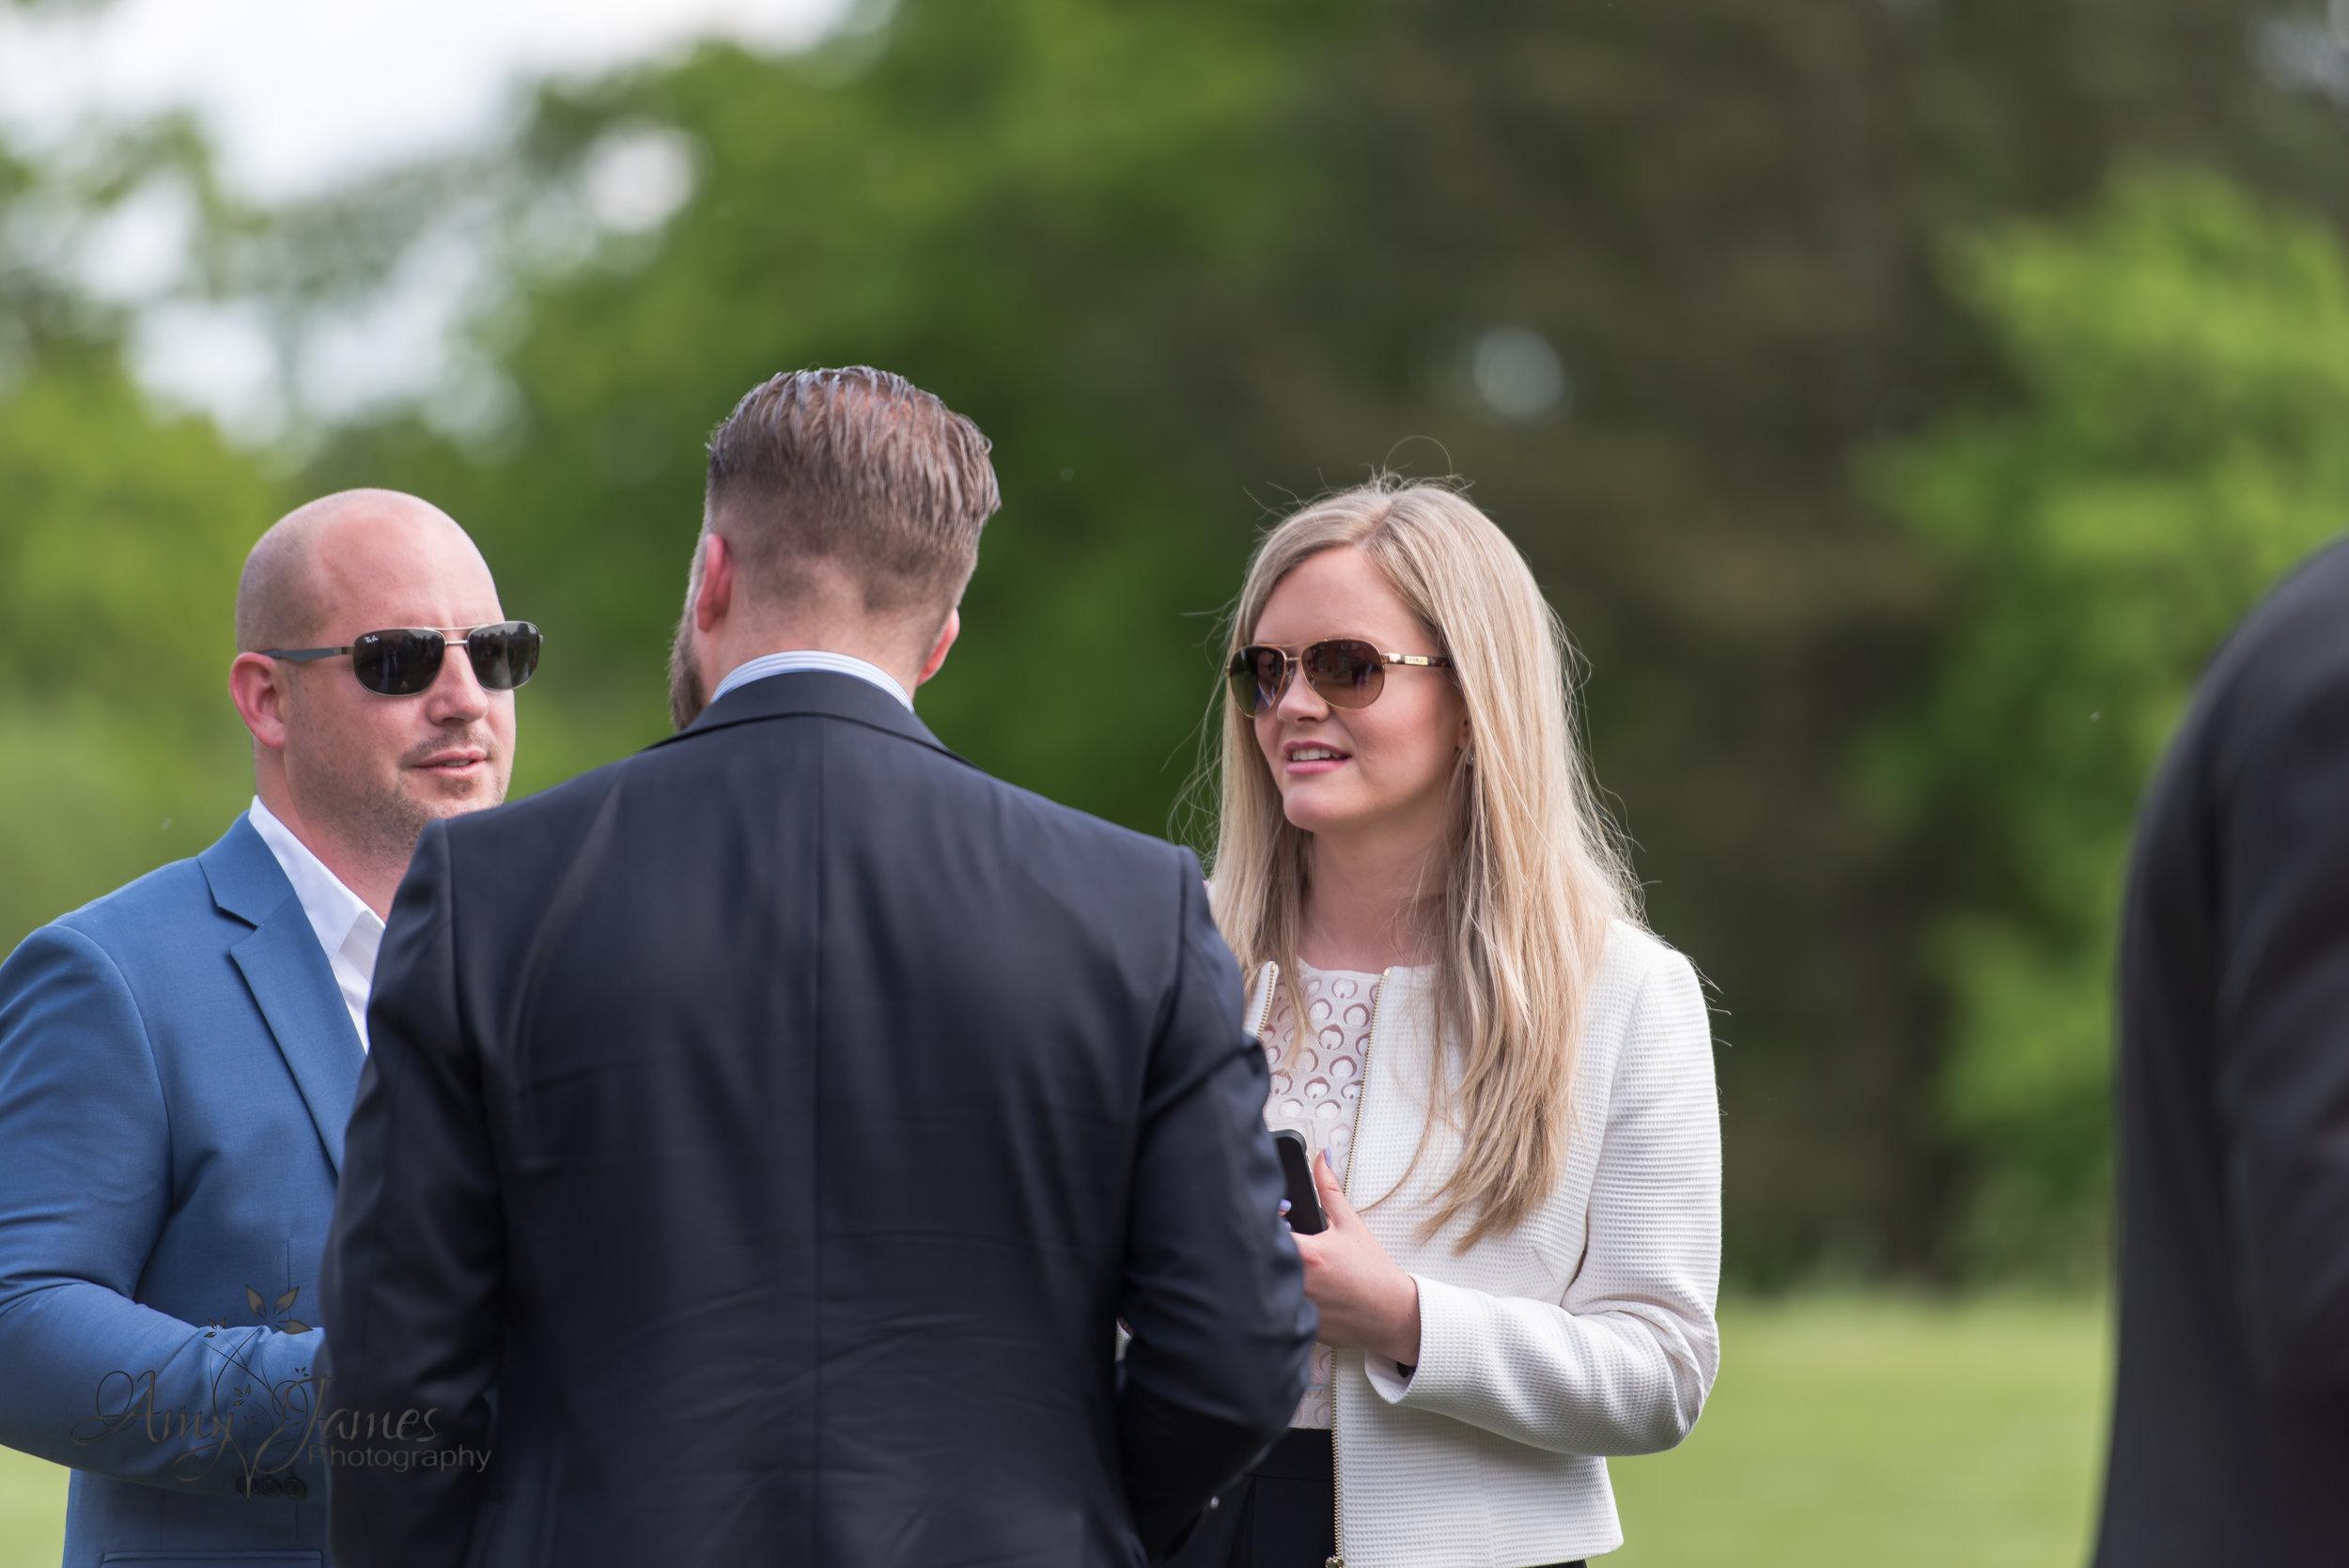 Highfield Park Hampshire wedding photographer | Highfield Park Wedding venue | Fleet wedding photographer | Amy James Photography